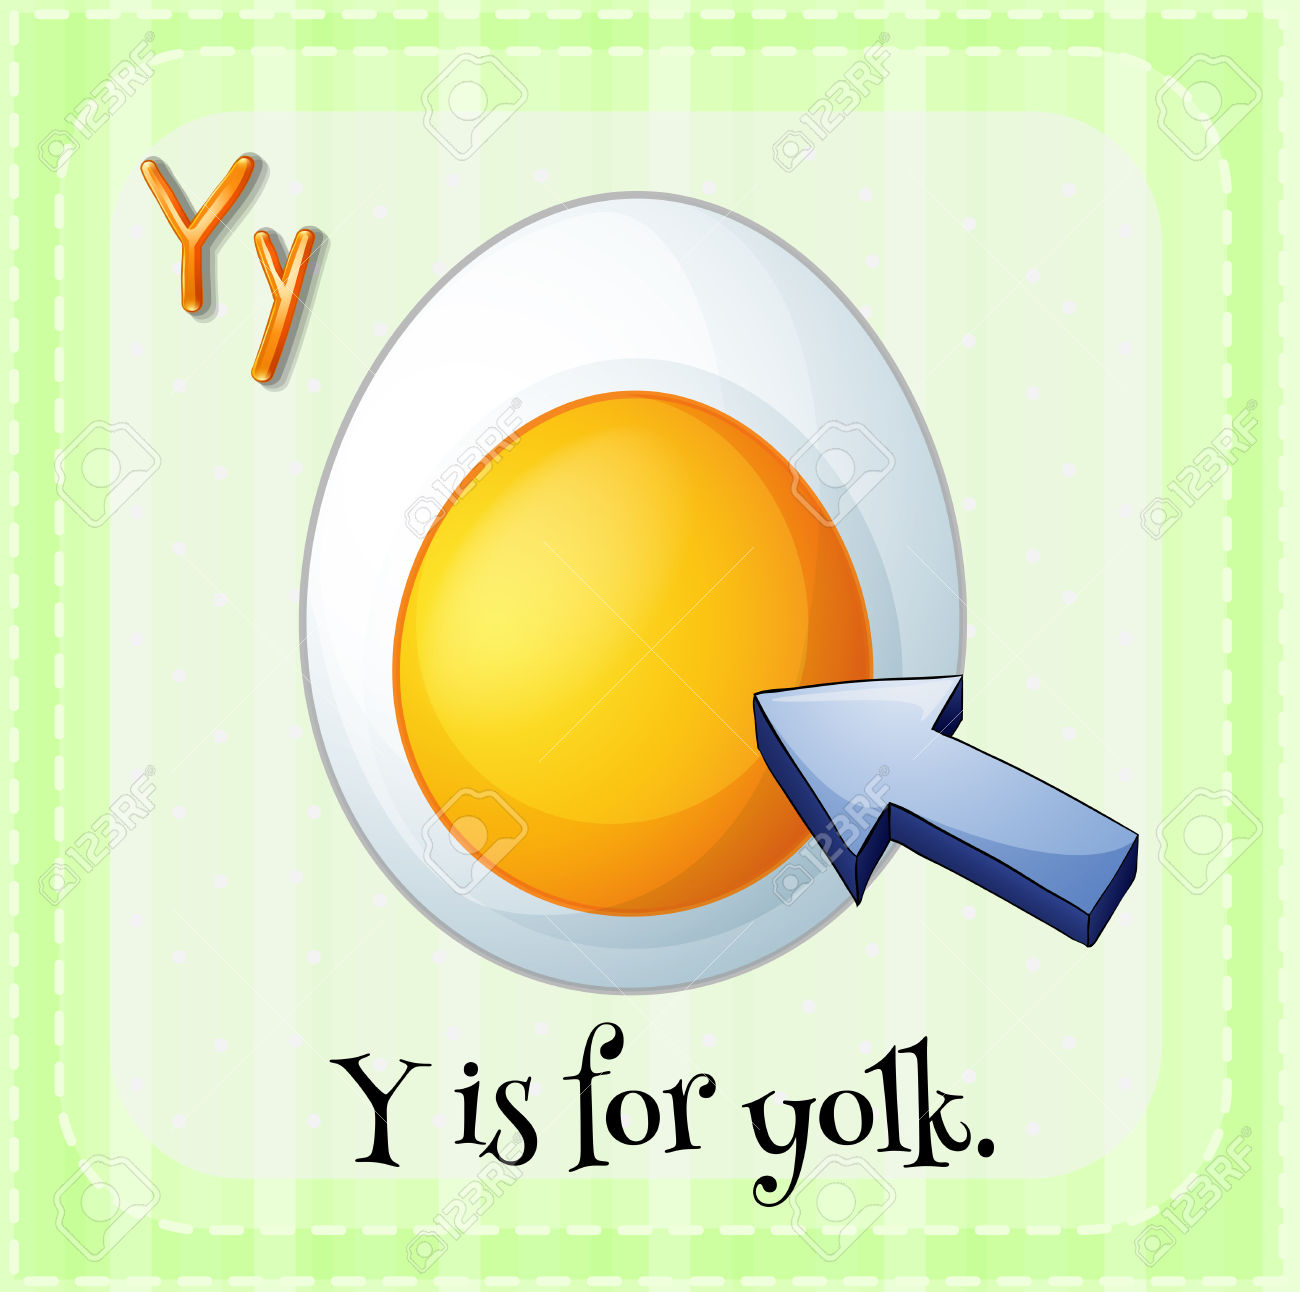 Clipart yolk png library stock Clipart yolk - ClipartFest png library stock